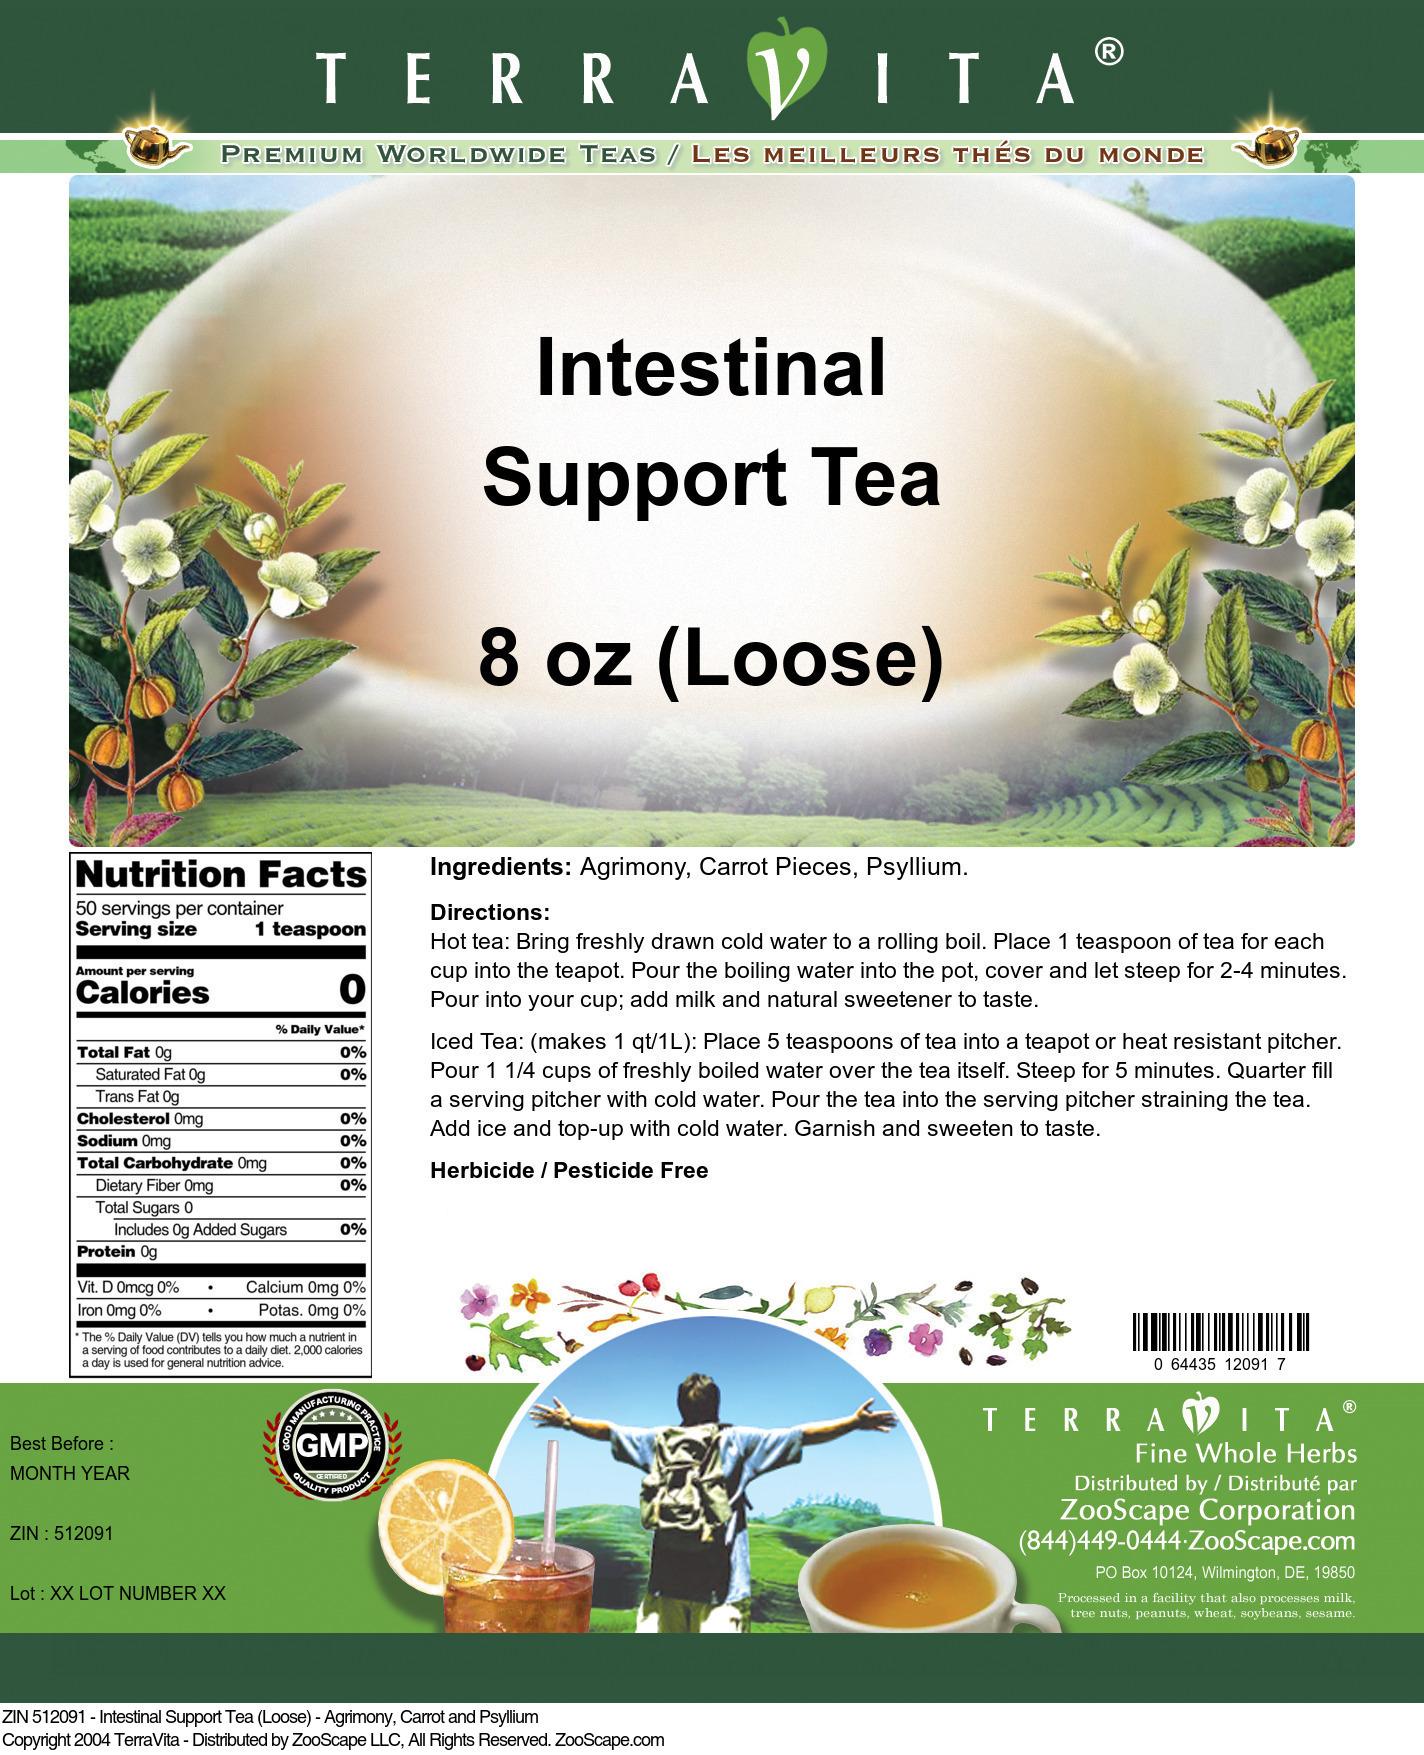 Intestinal Support